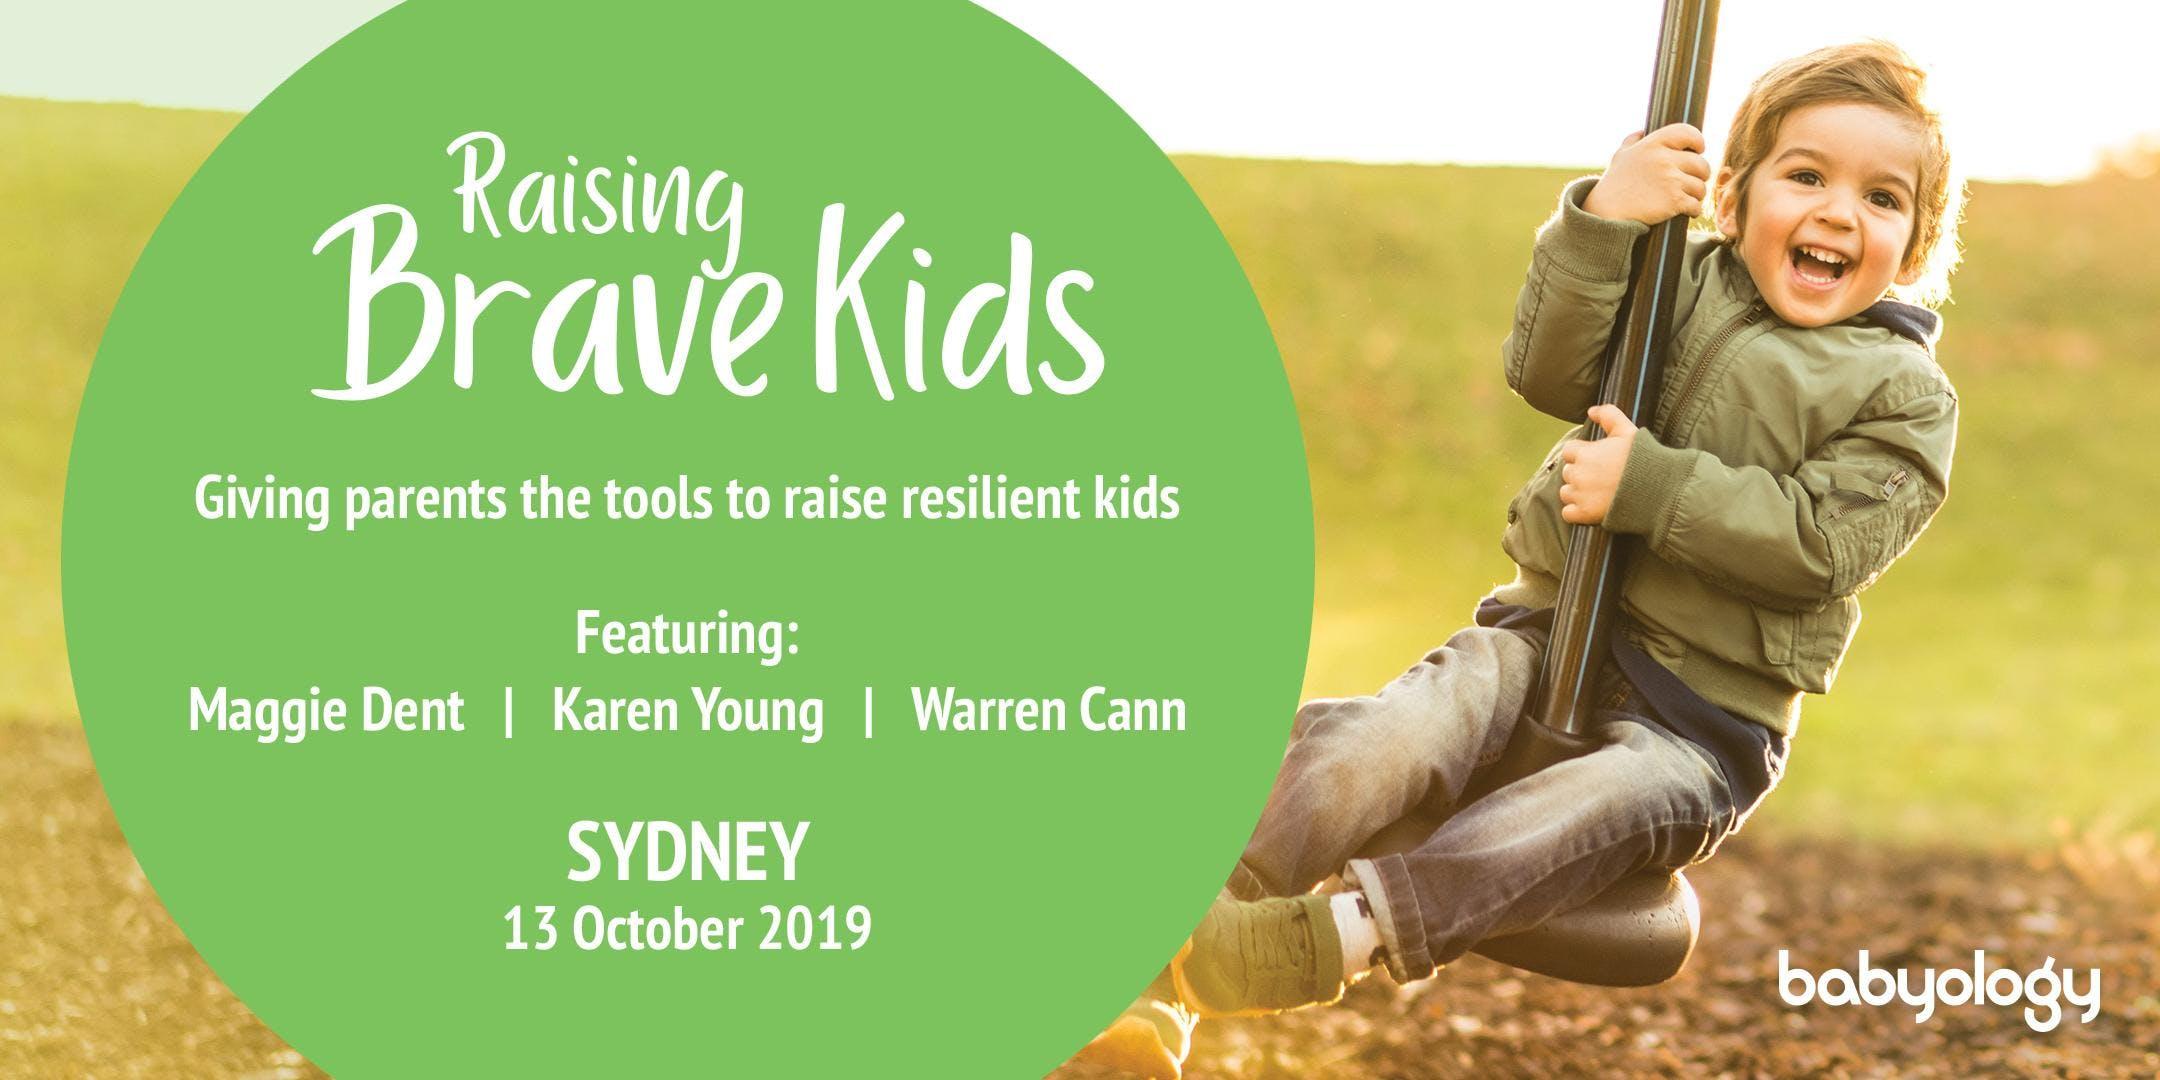 Raising Brave Kids with Maggie Dent - A Babyology Parent Workshop